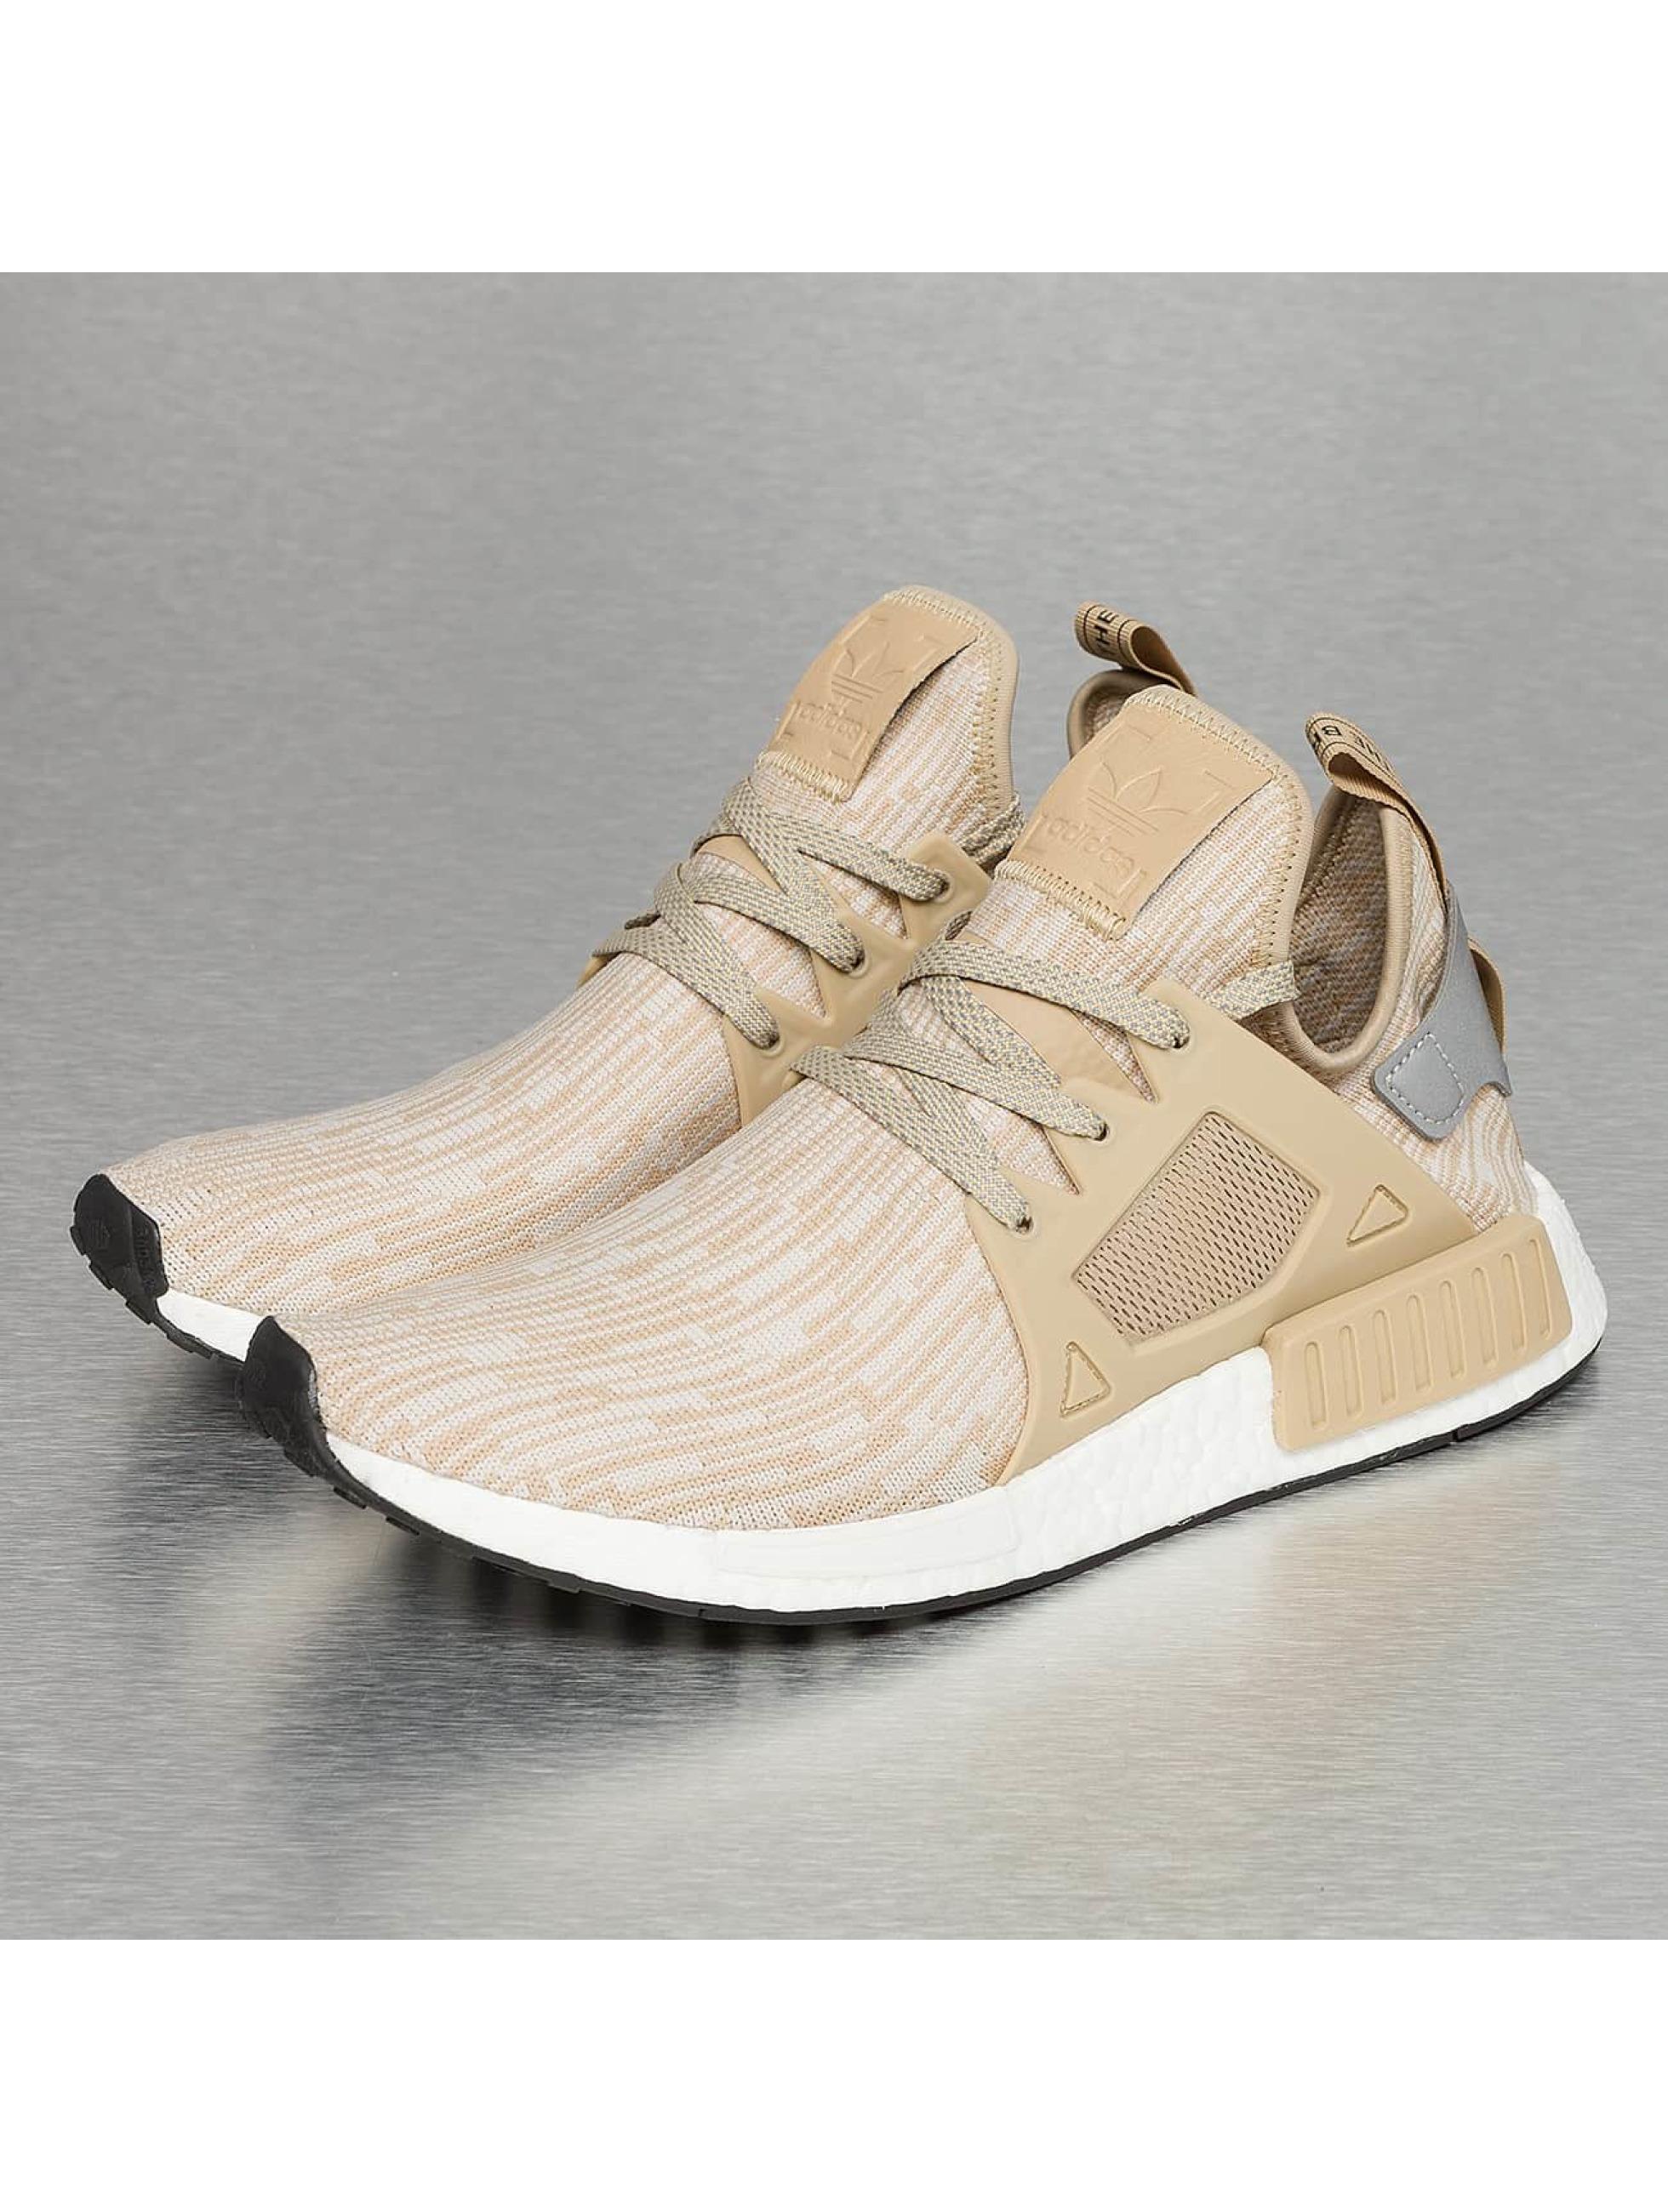 adidas sko sneakers nmd xr1 i beige 303126. Black Bedroom Furniture Sets. Home Design Ideas